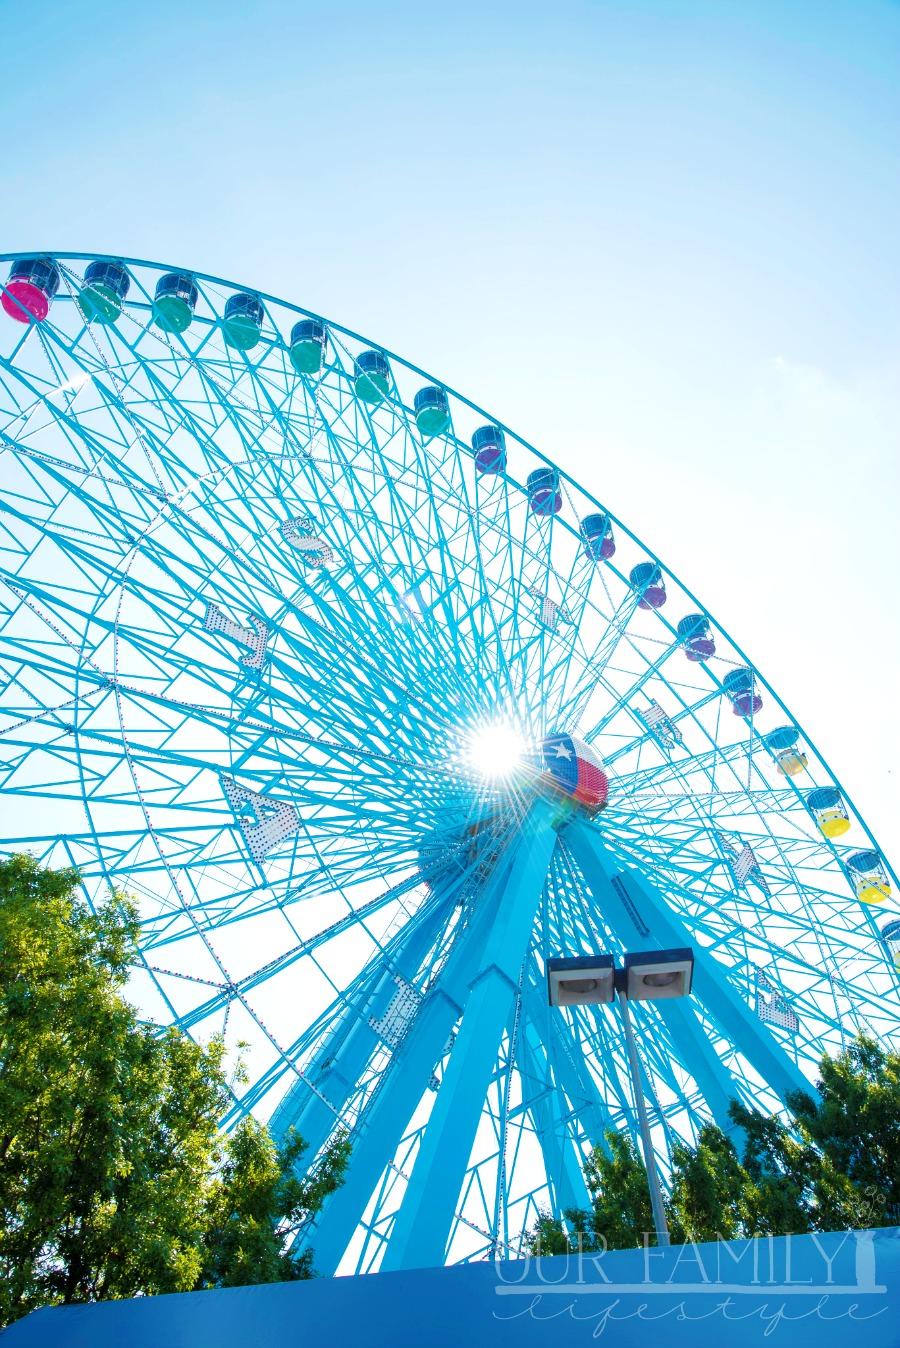 Texas Star® Ferris wheel